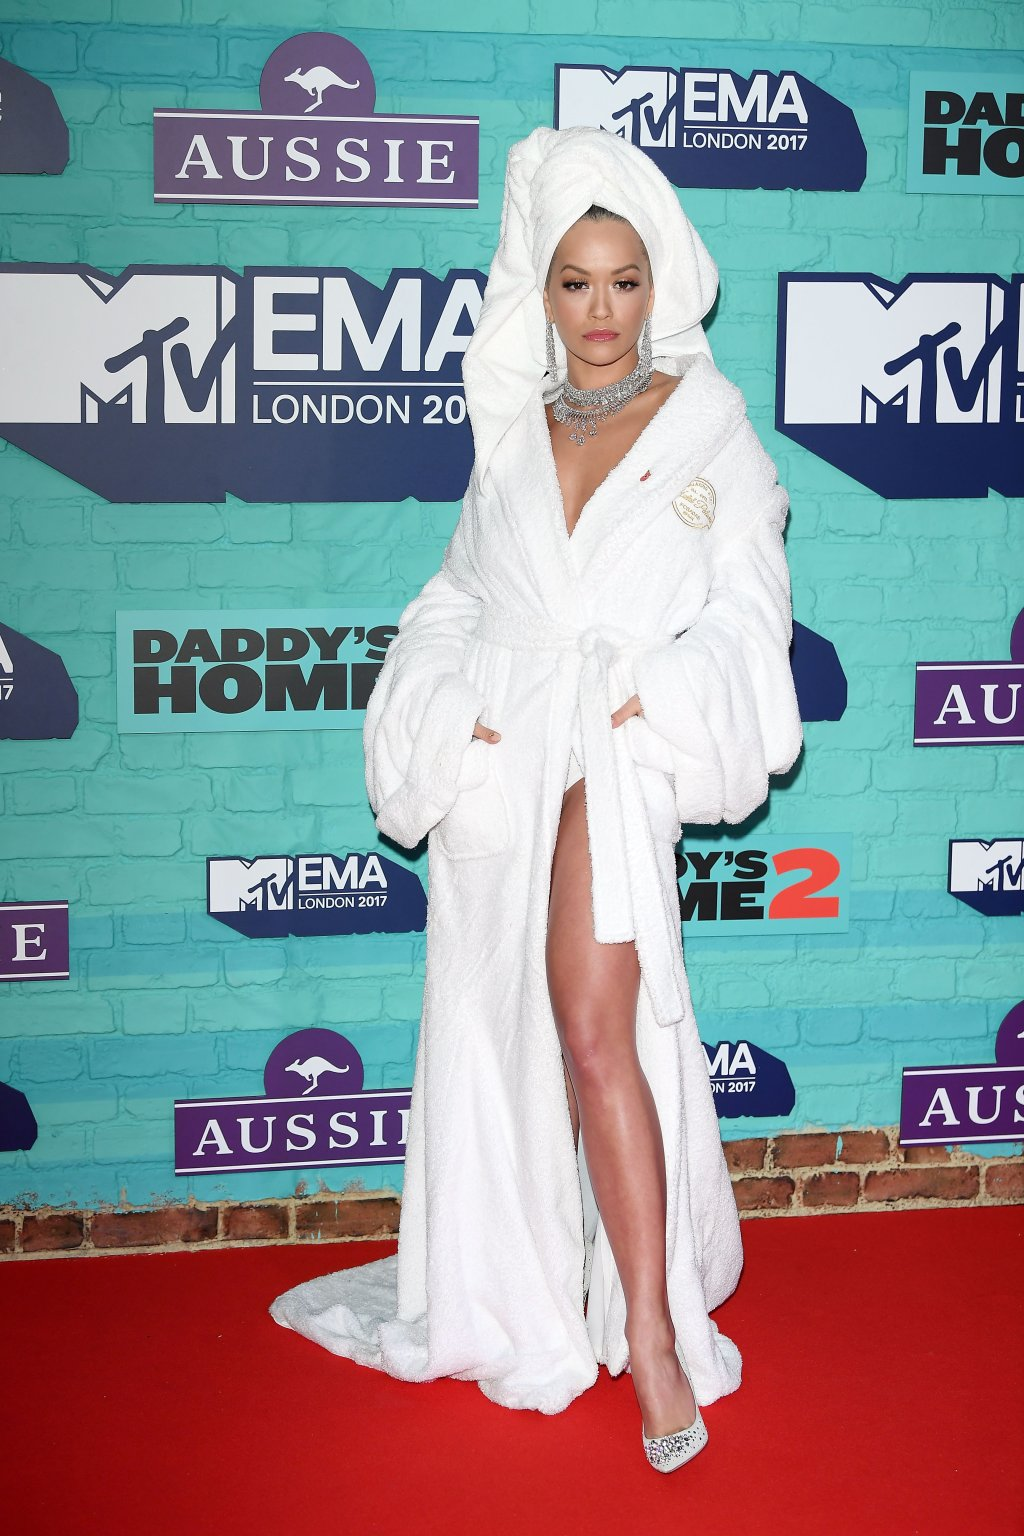 MTV EMAs 2017 - Red Carpet Arrivals